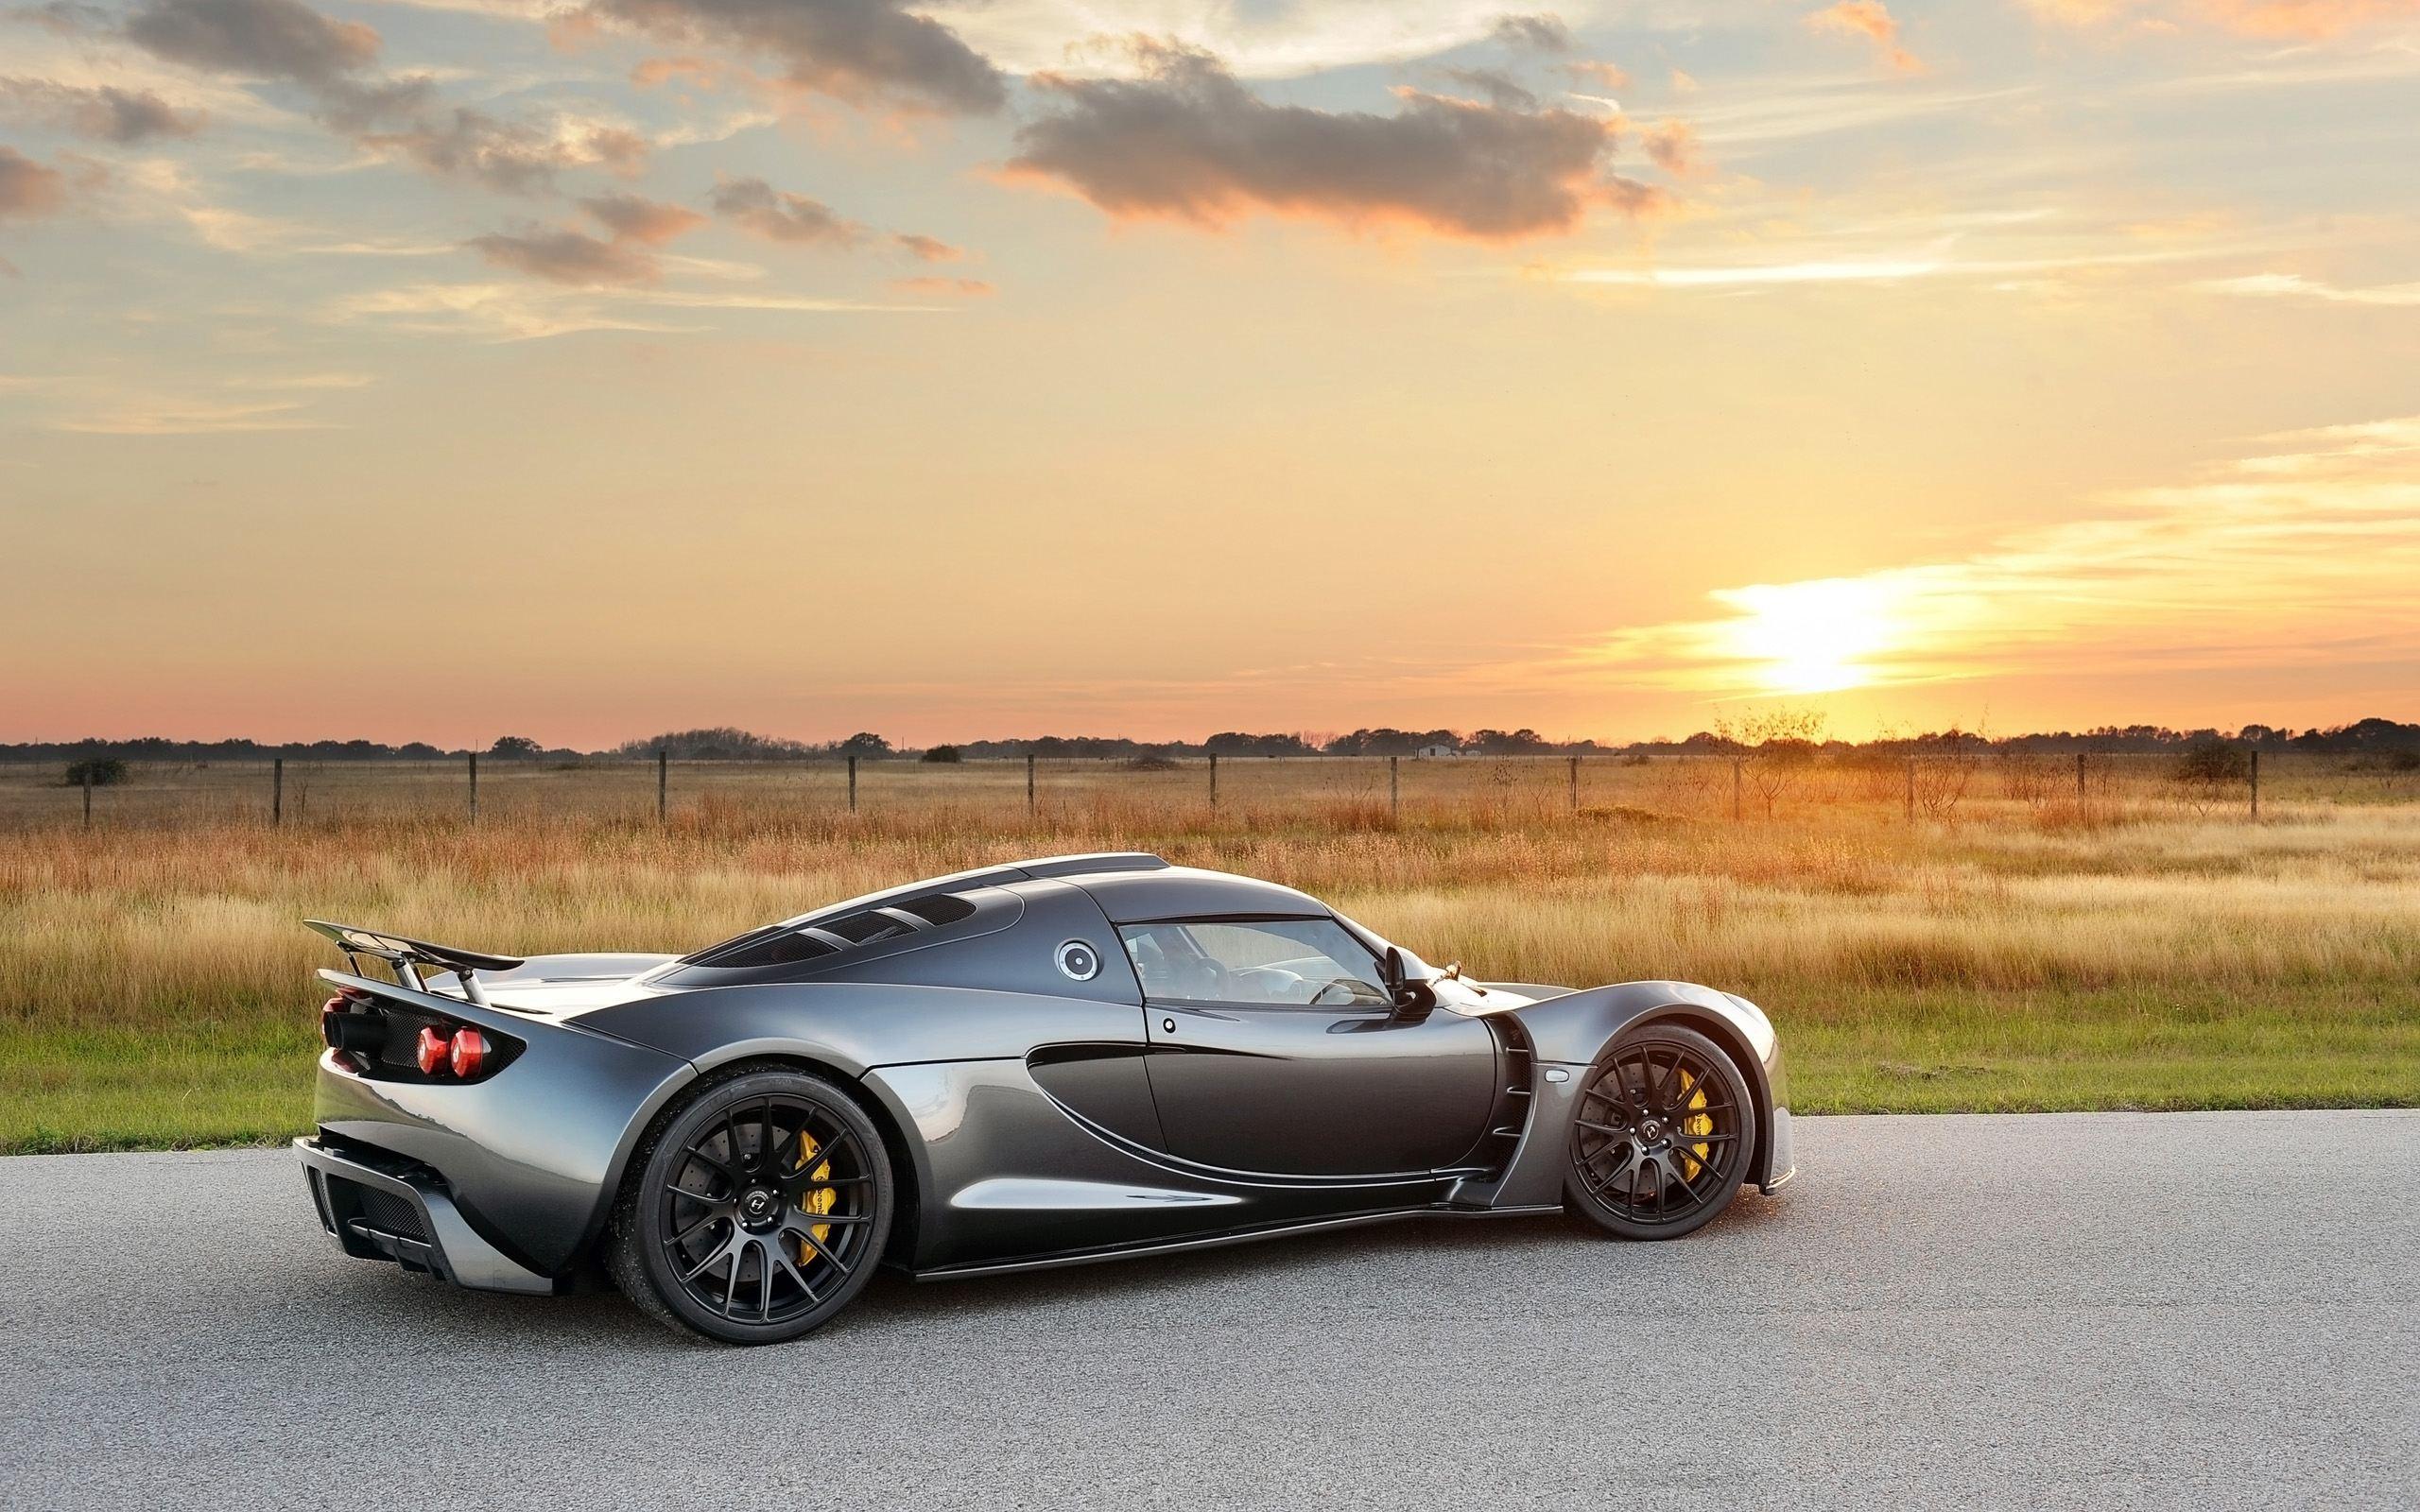 Hennessey-Venom-GT-Dark-Knight-Static-7-2560x1600